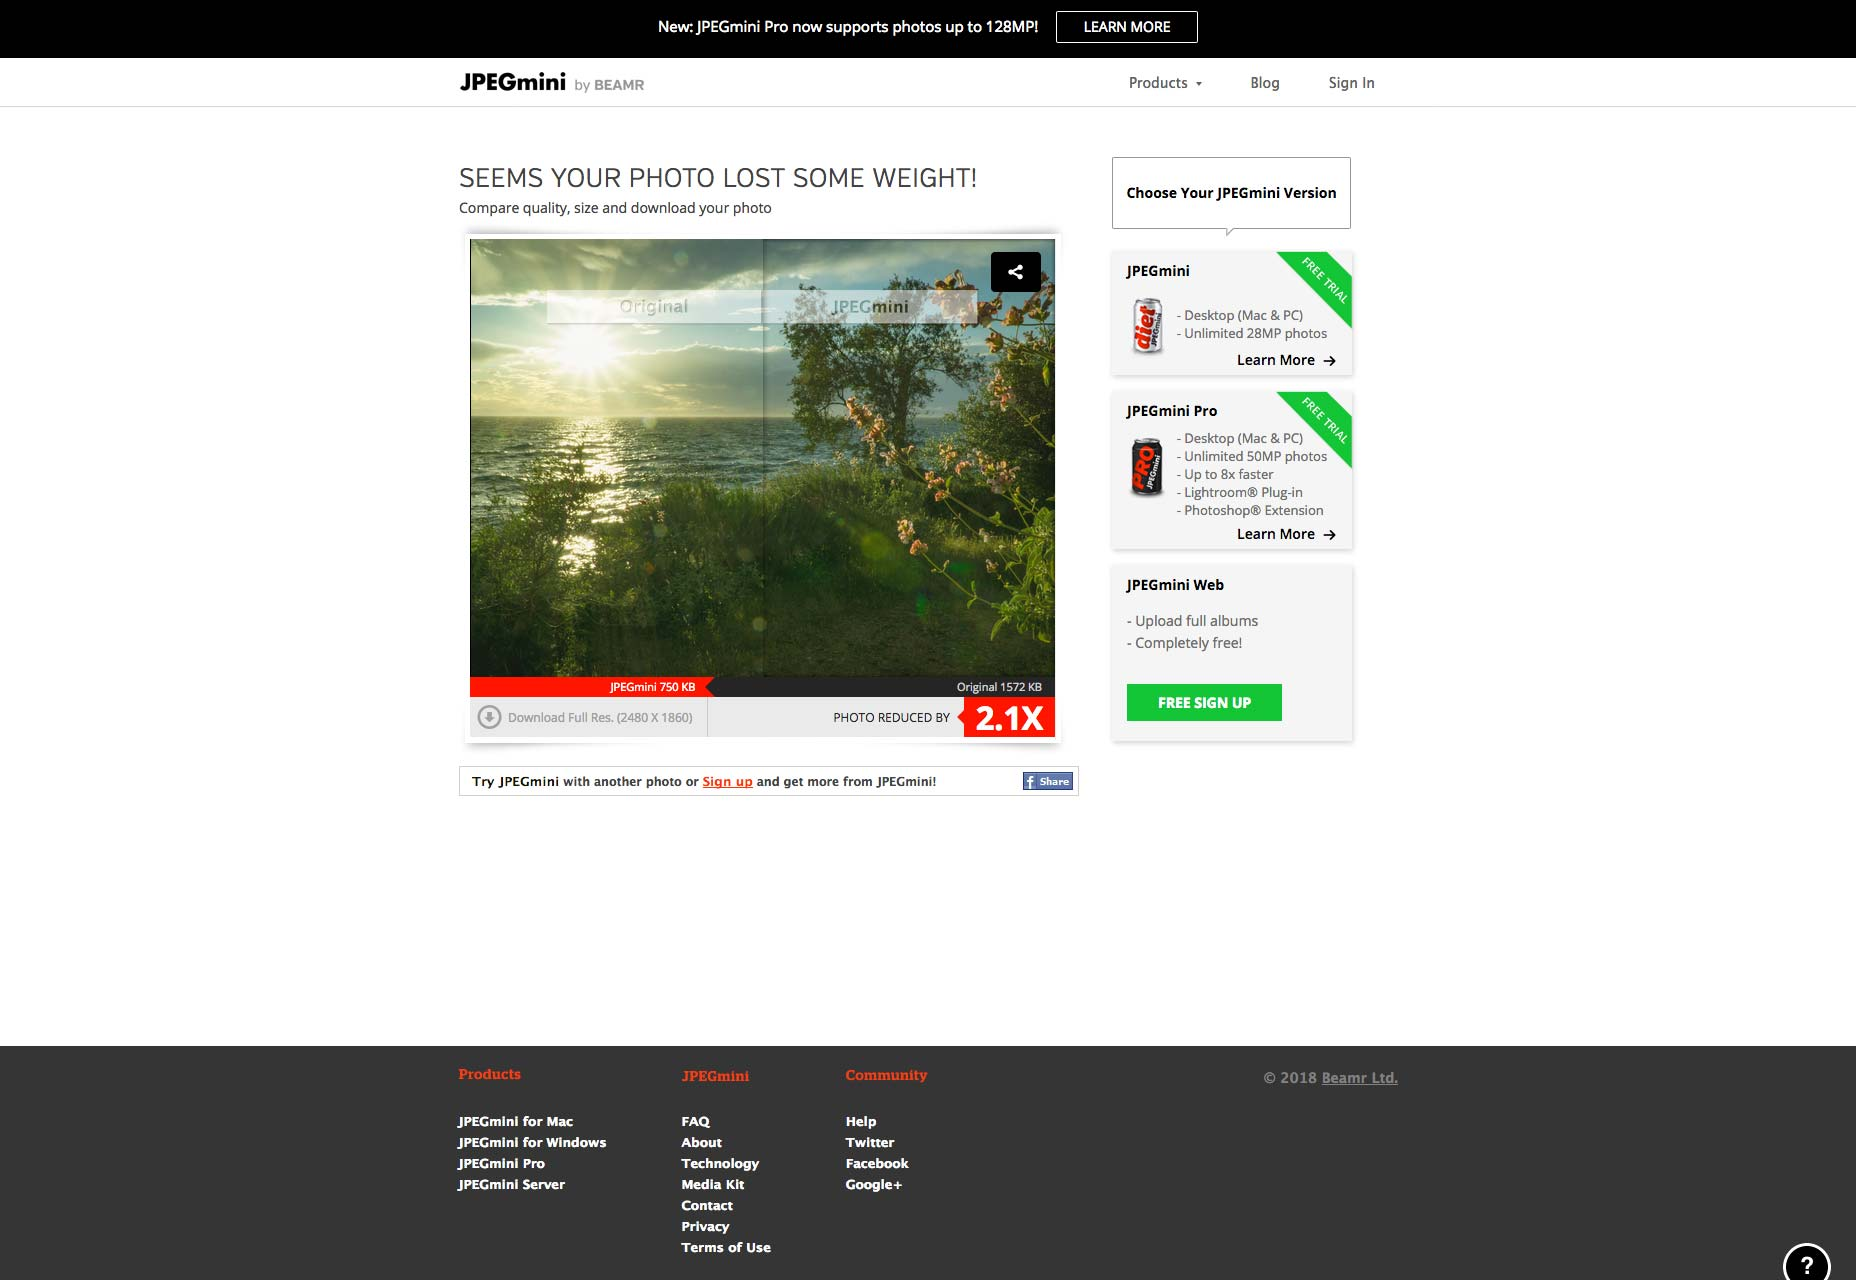 The Best Image Compression Tools for the Web | Webdesigner Depot